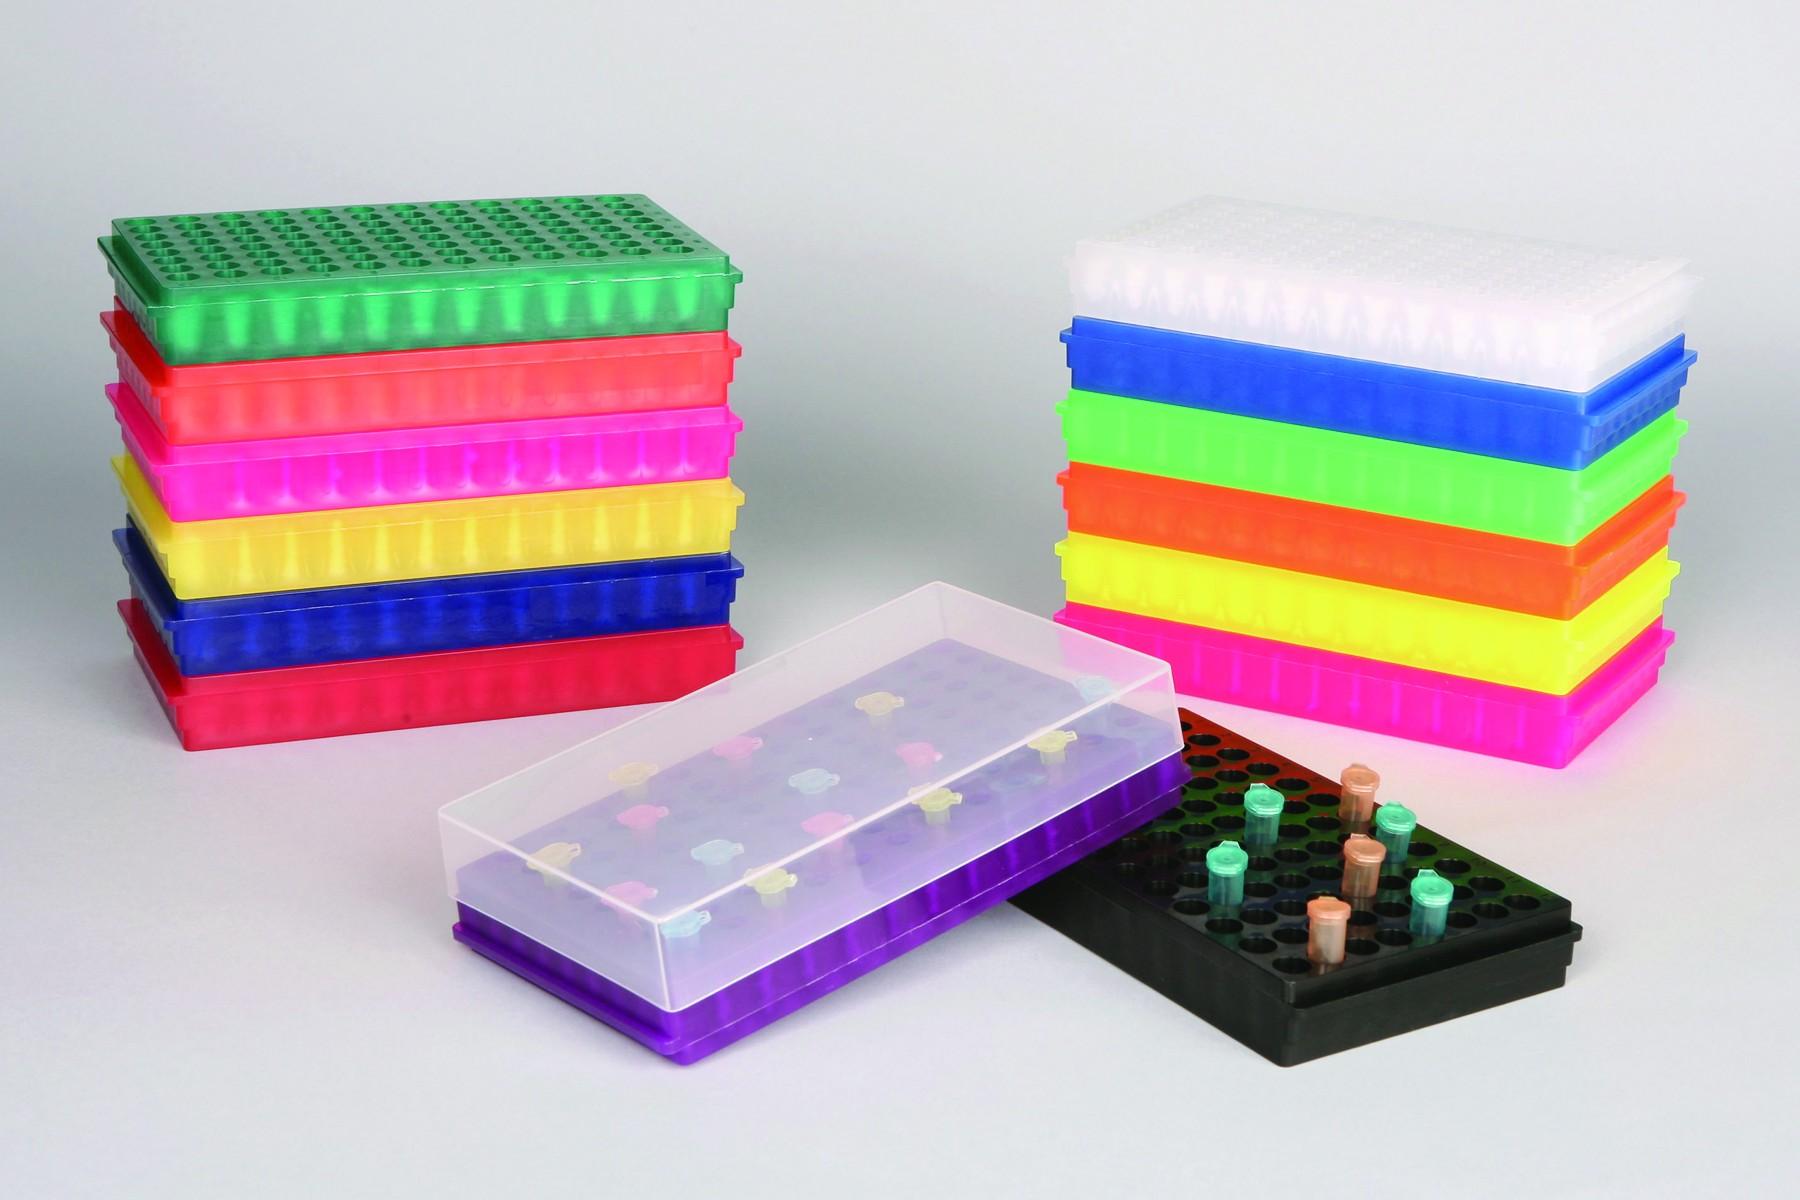 96-Well Microcentrifuge Tube Racks